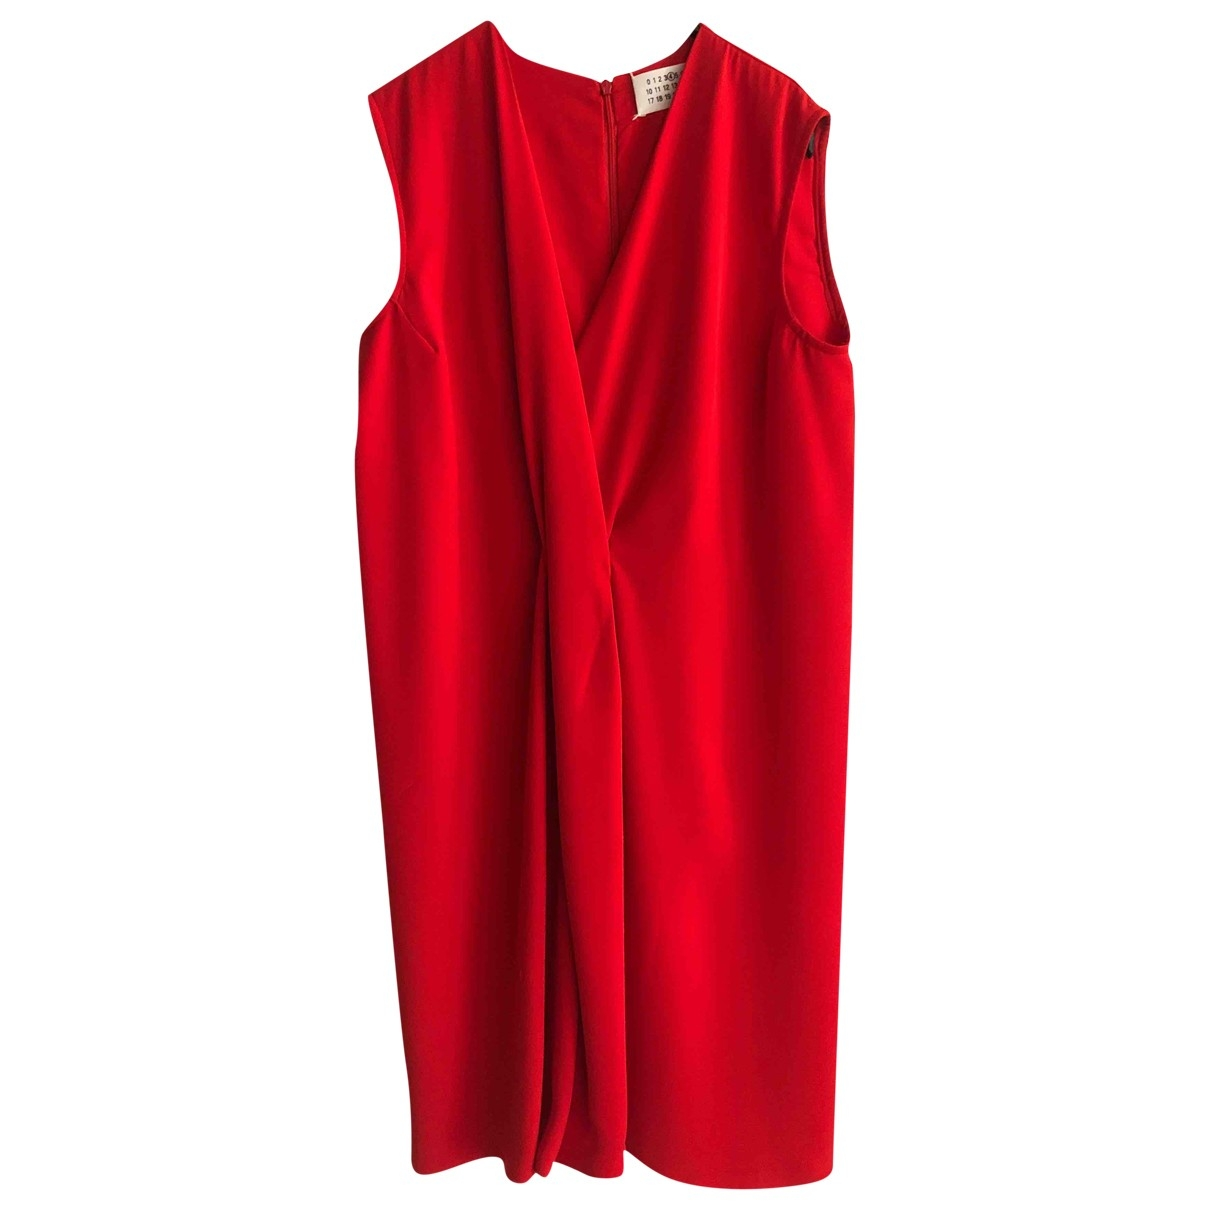 Maison Martin Margiela \N Red dress for Women 46 IT